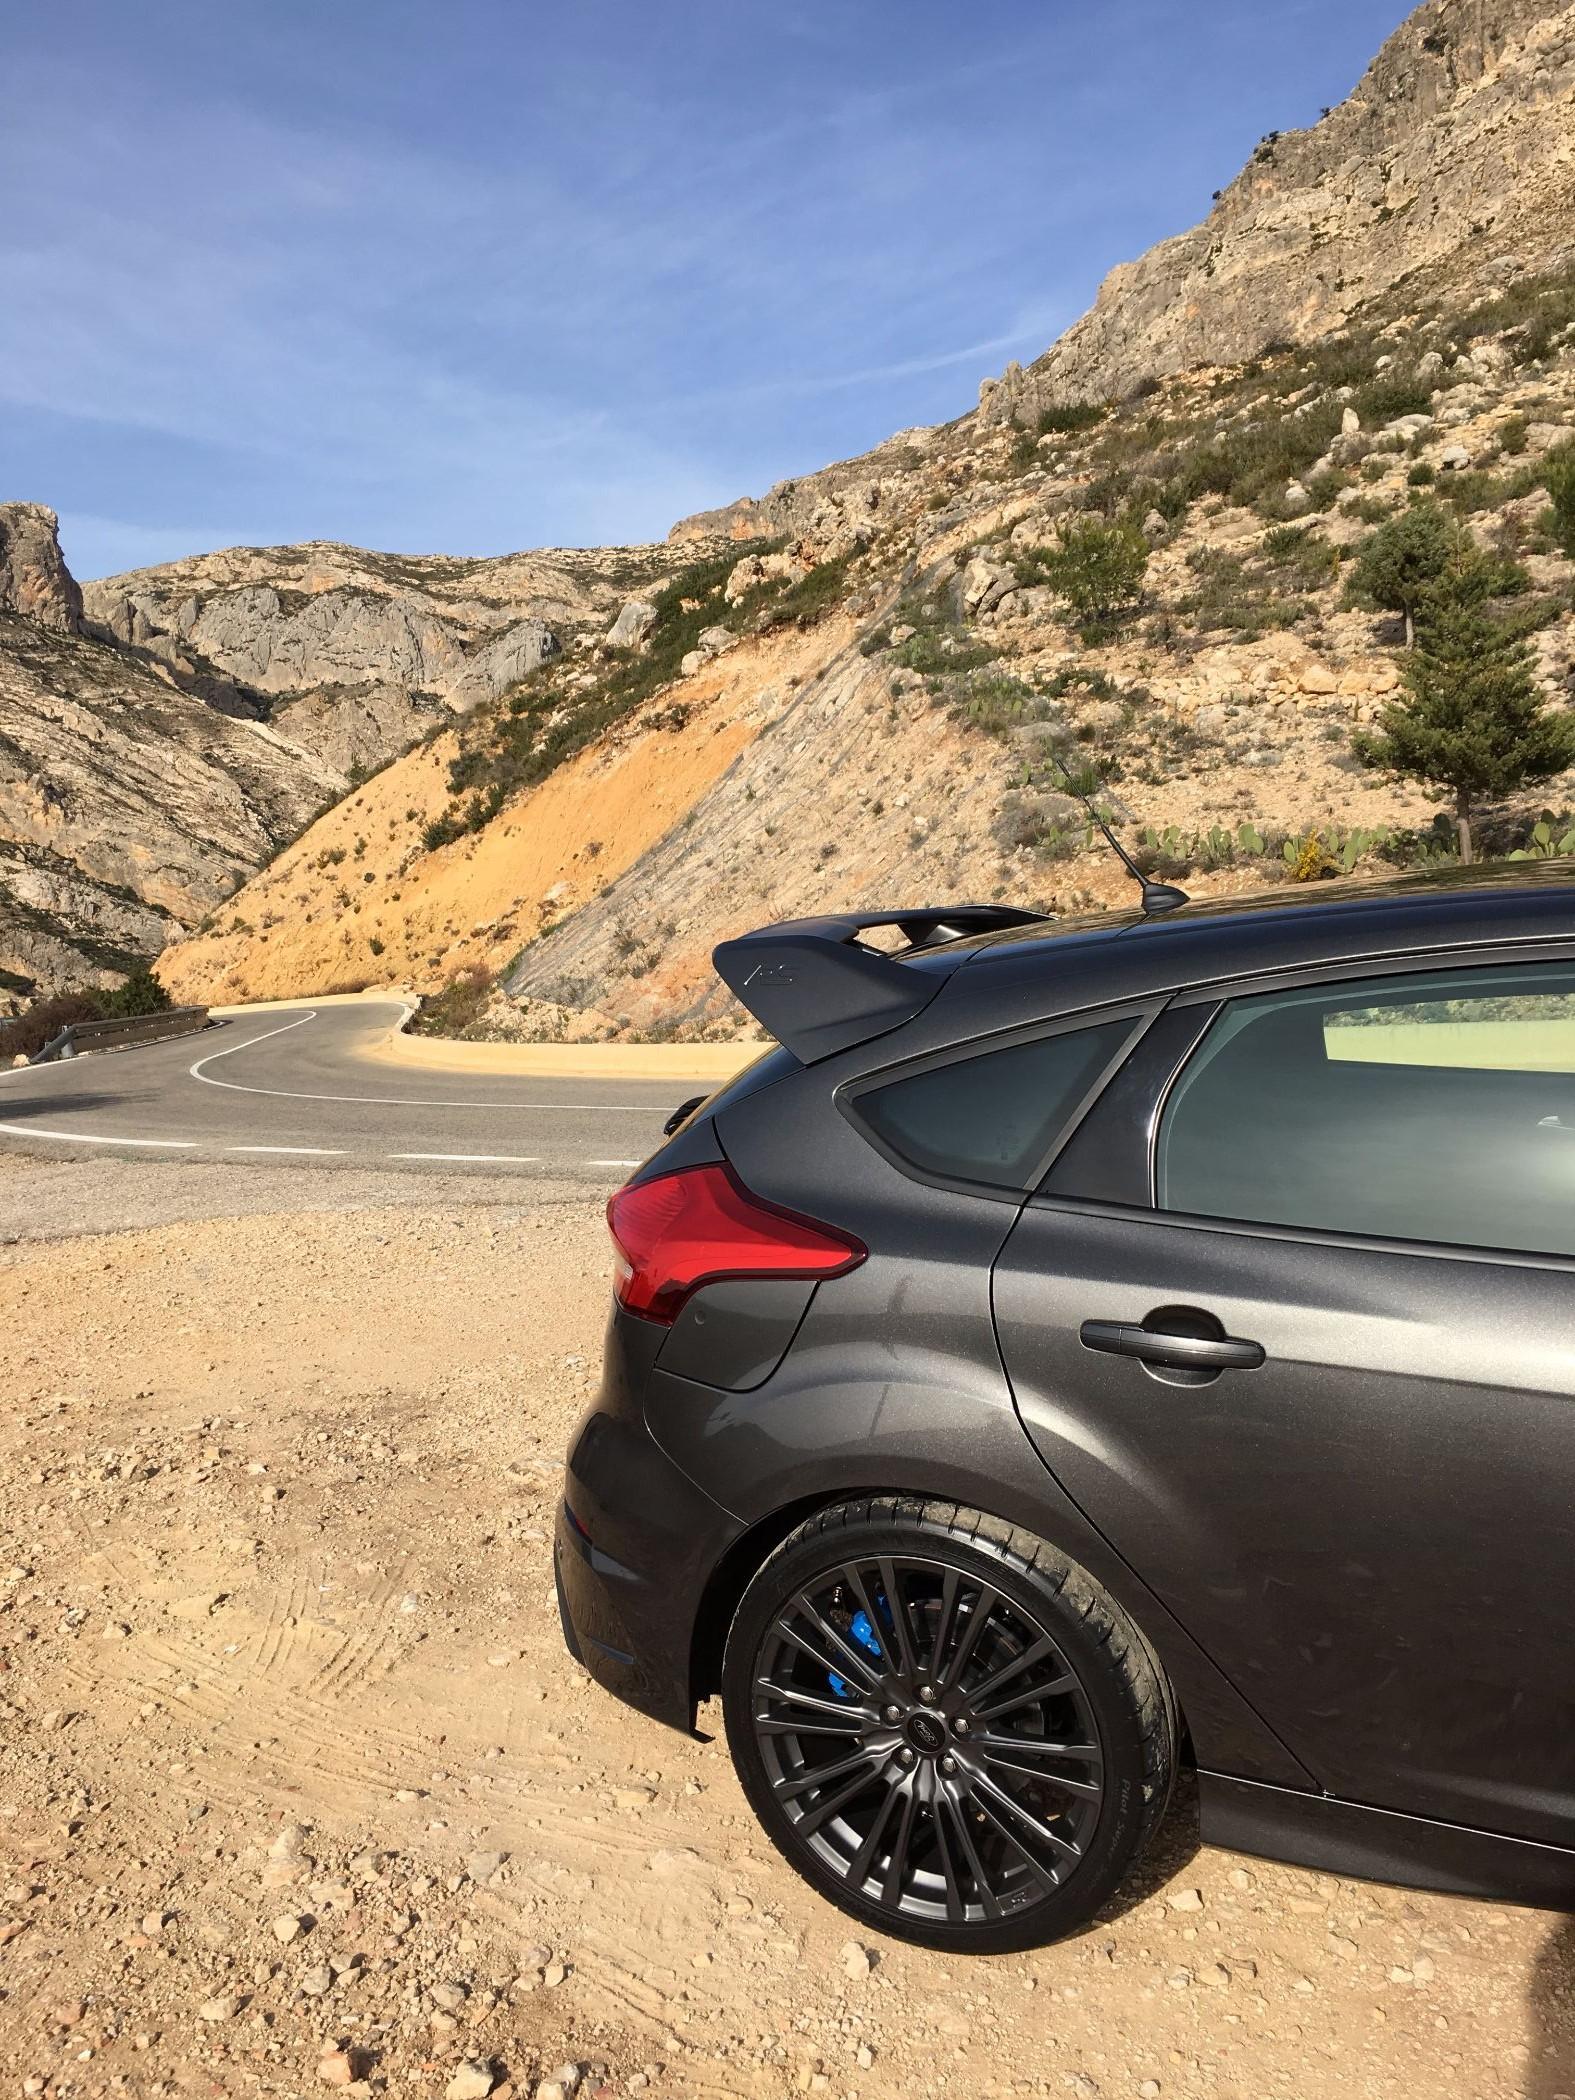 Ford Focus RS Heck und Felge 2016